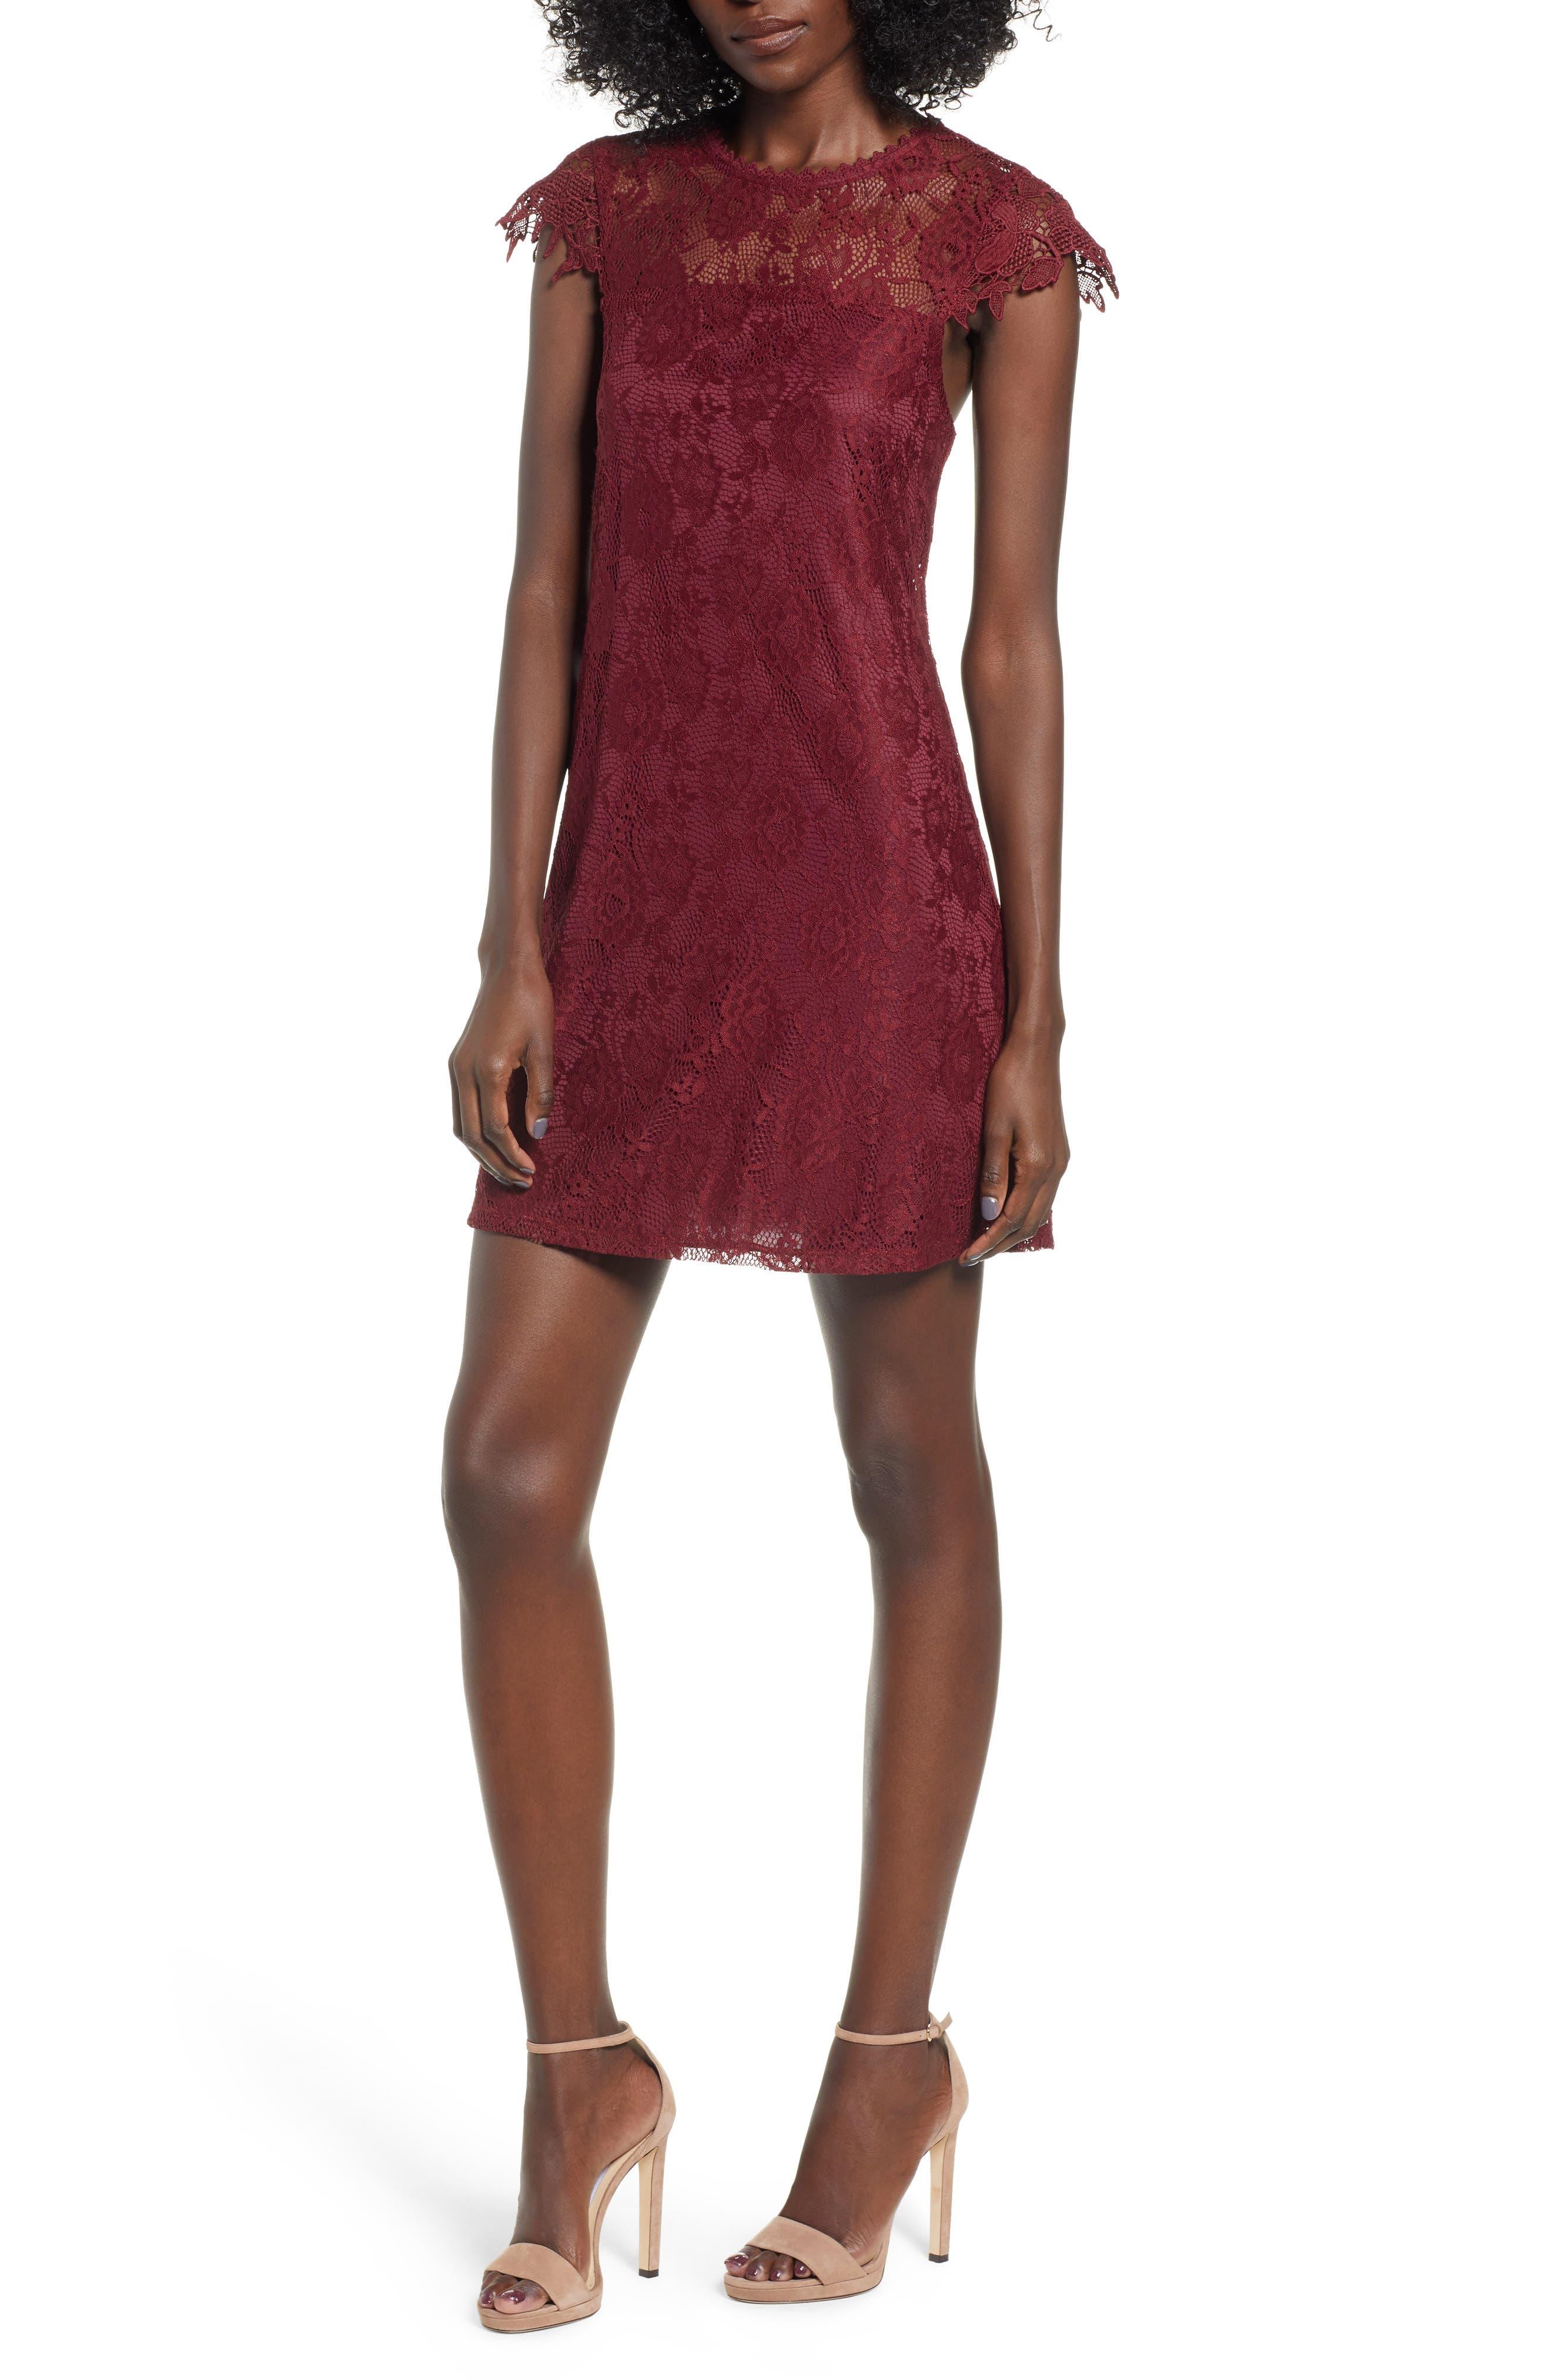 SPEECHLESS Lace Cap Sleeve Sheath, Main, color, WINE